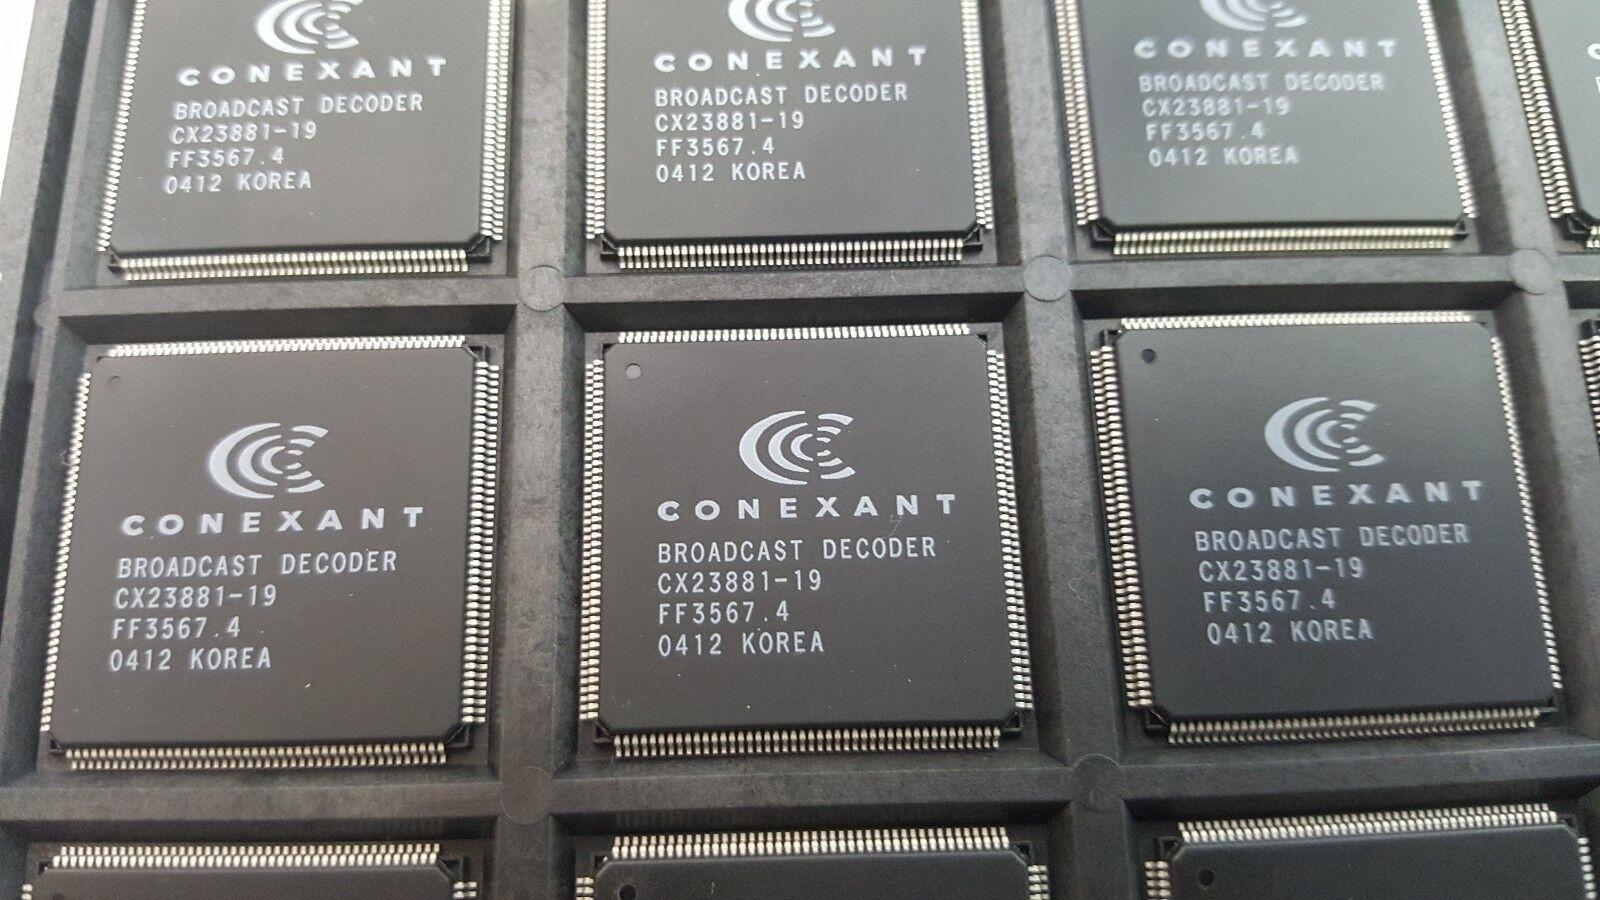 CONEXANT BROADCAST DECODER CX23881 WINDOWS 7 DRIVER